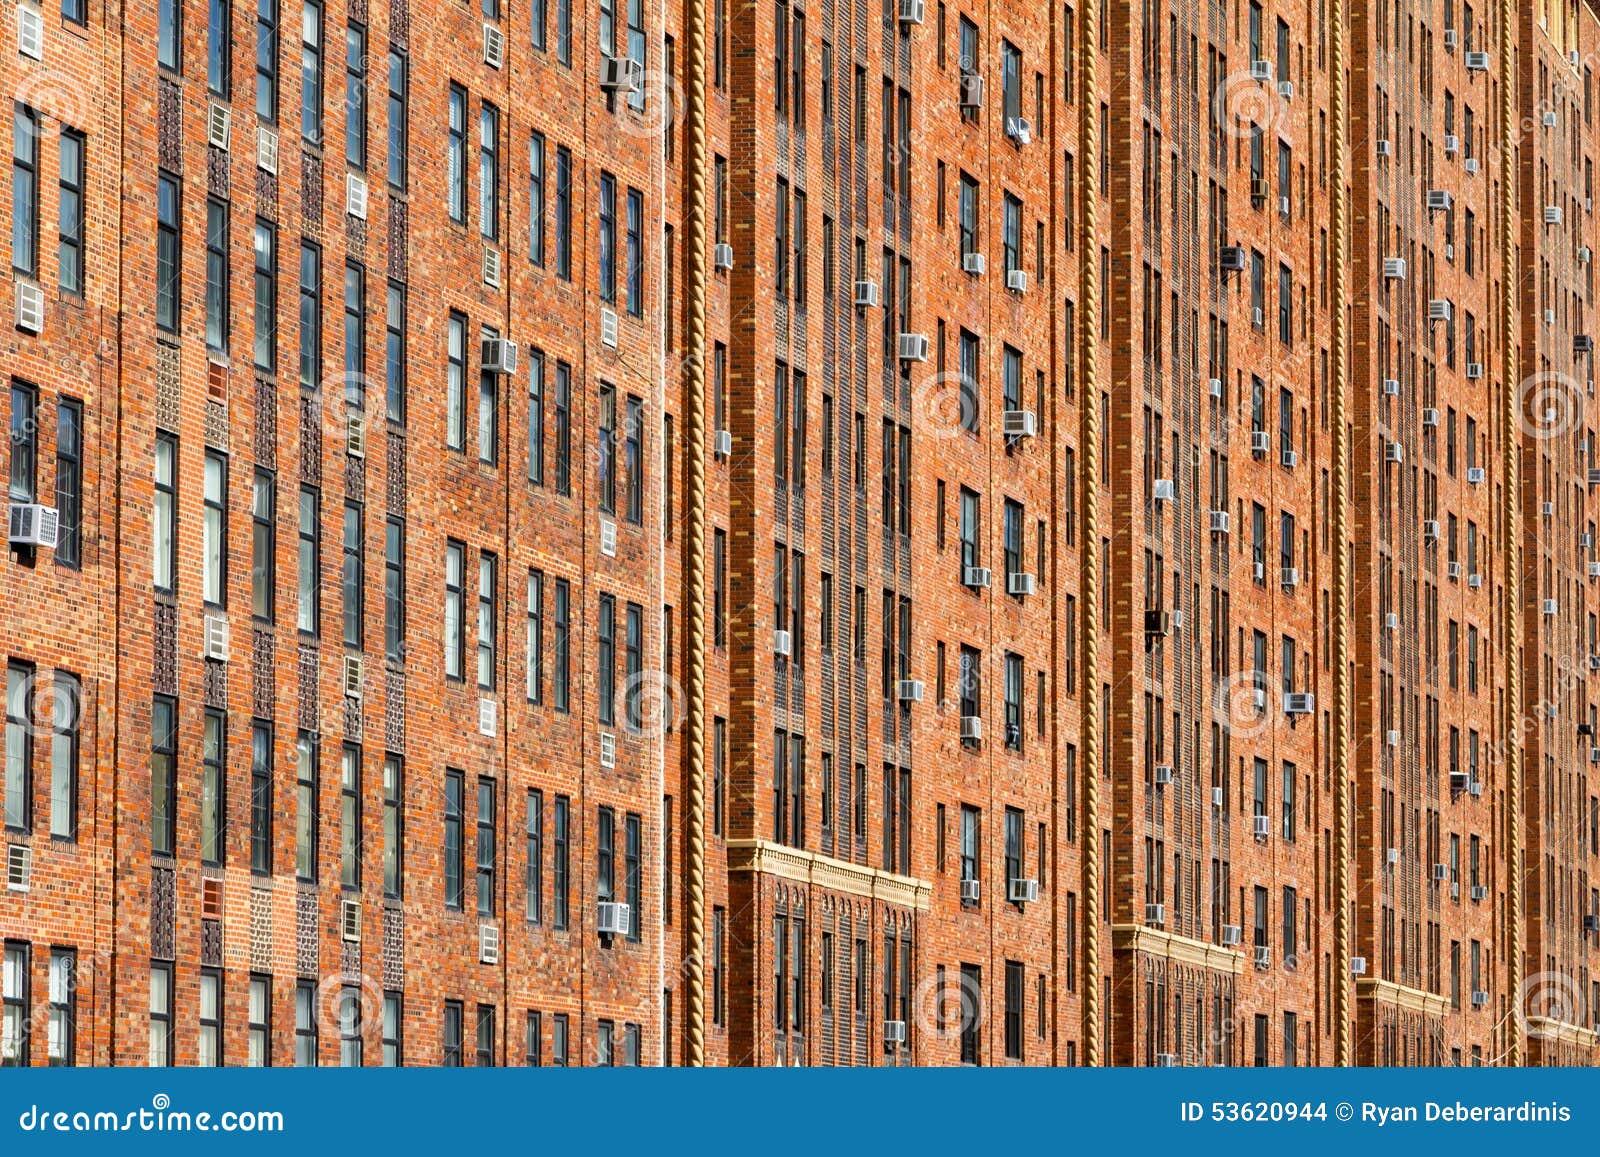 New York City Apartment Building Background Stock Photo Image